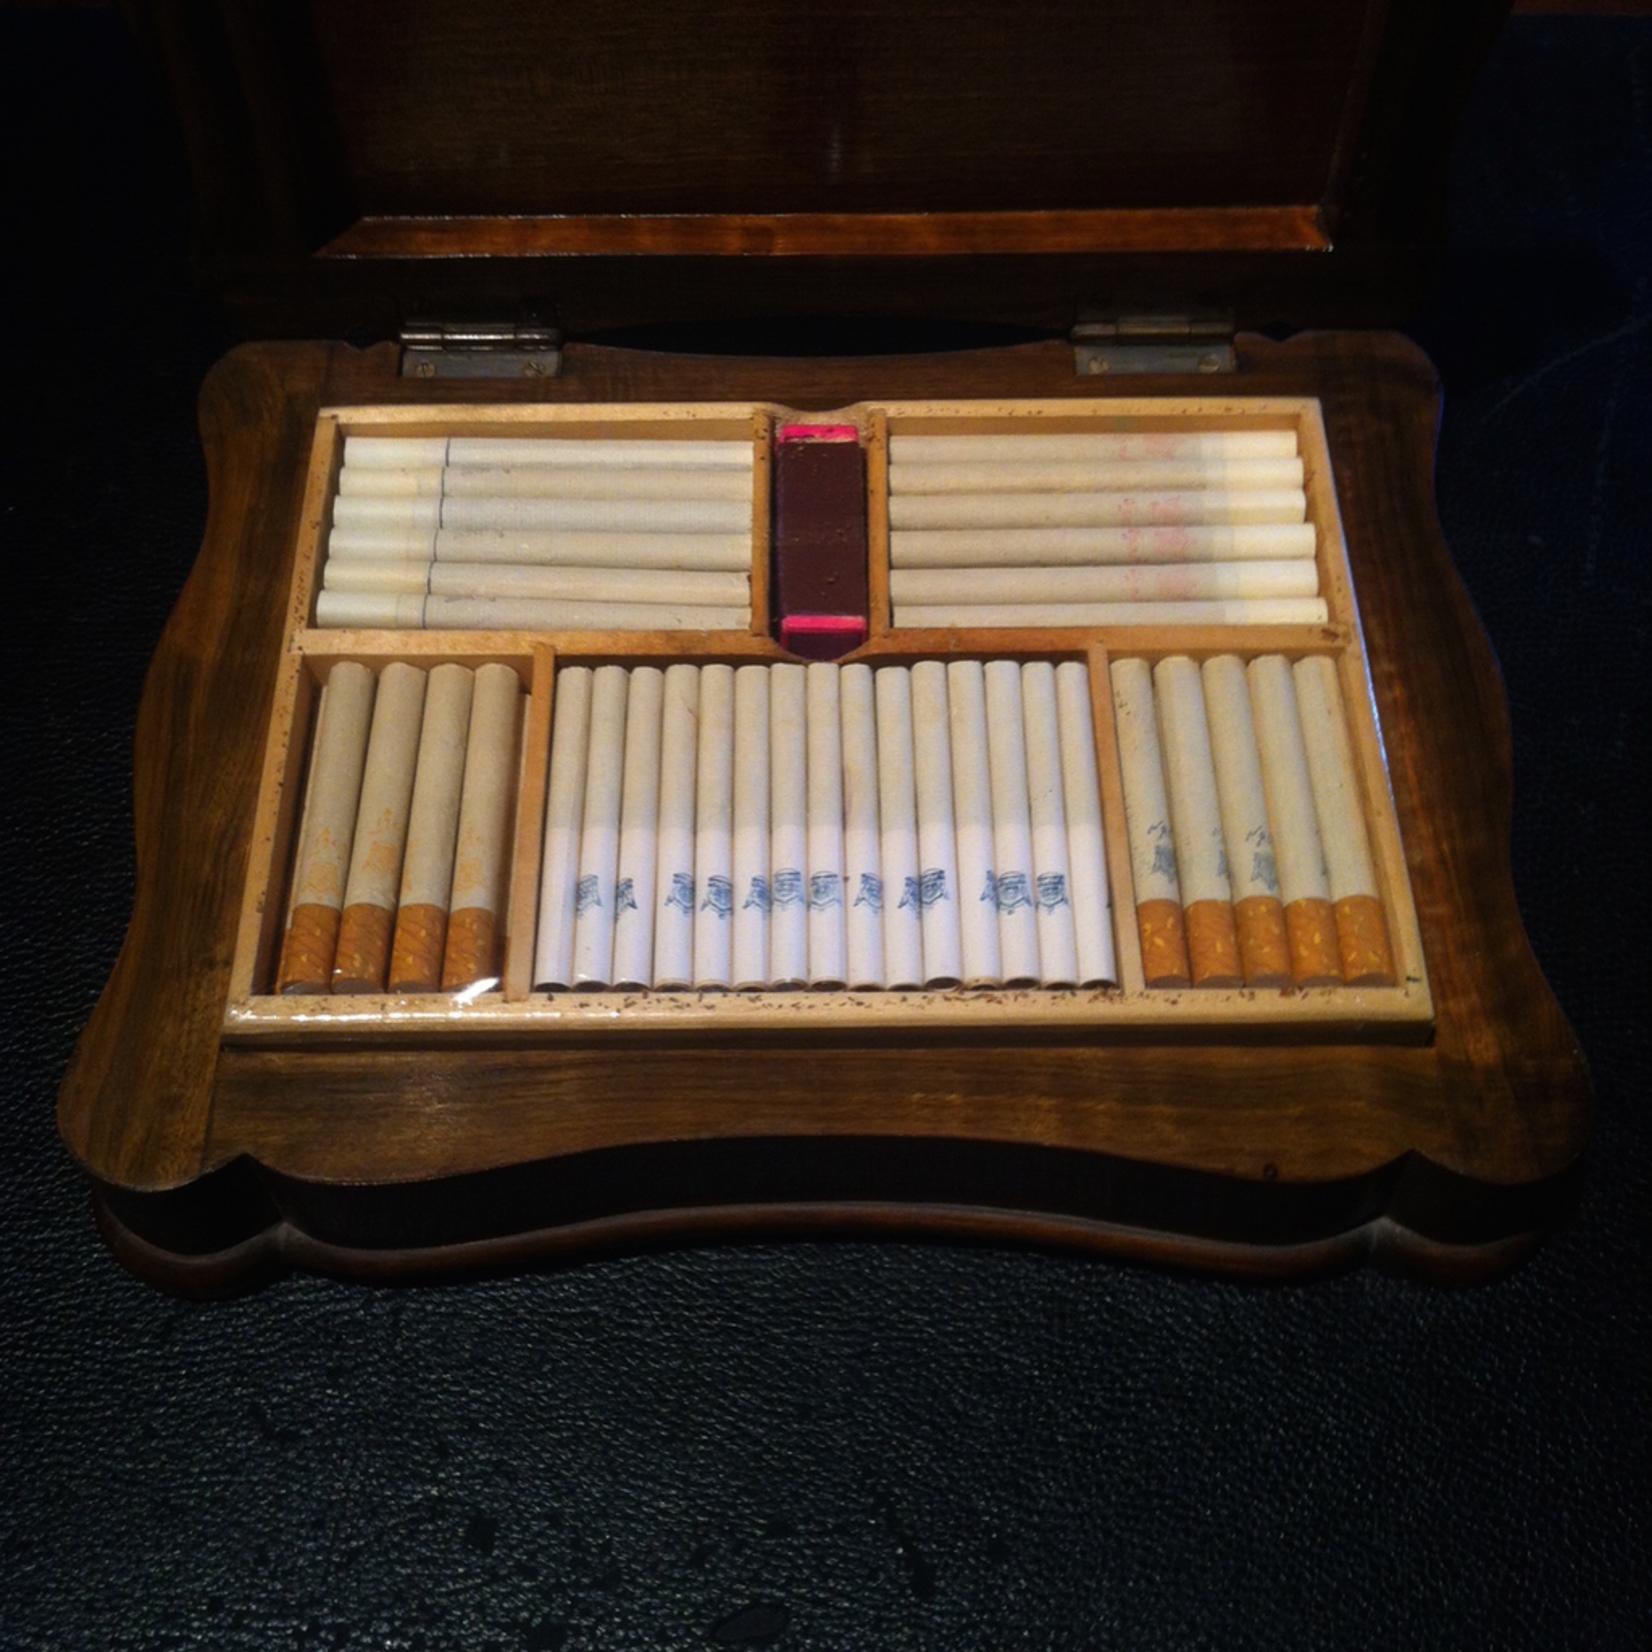 TAJHOME Cigar Wood Box Vintage S NEW